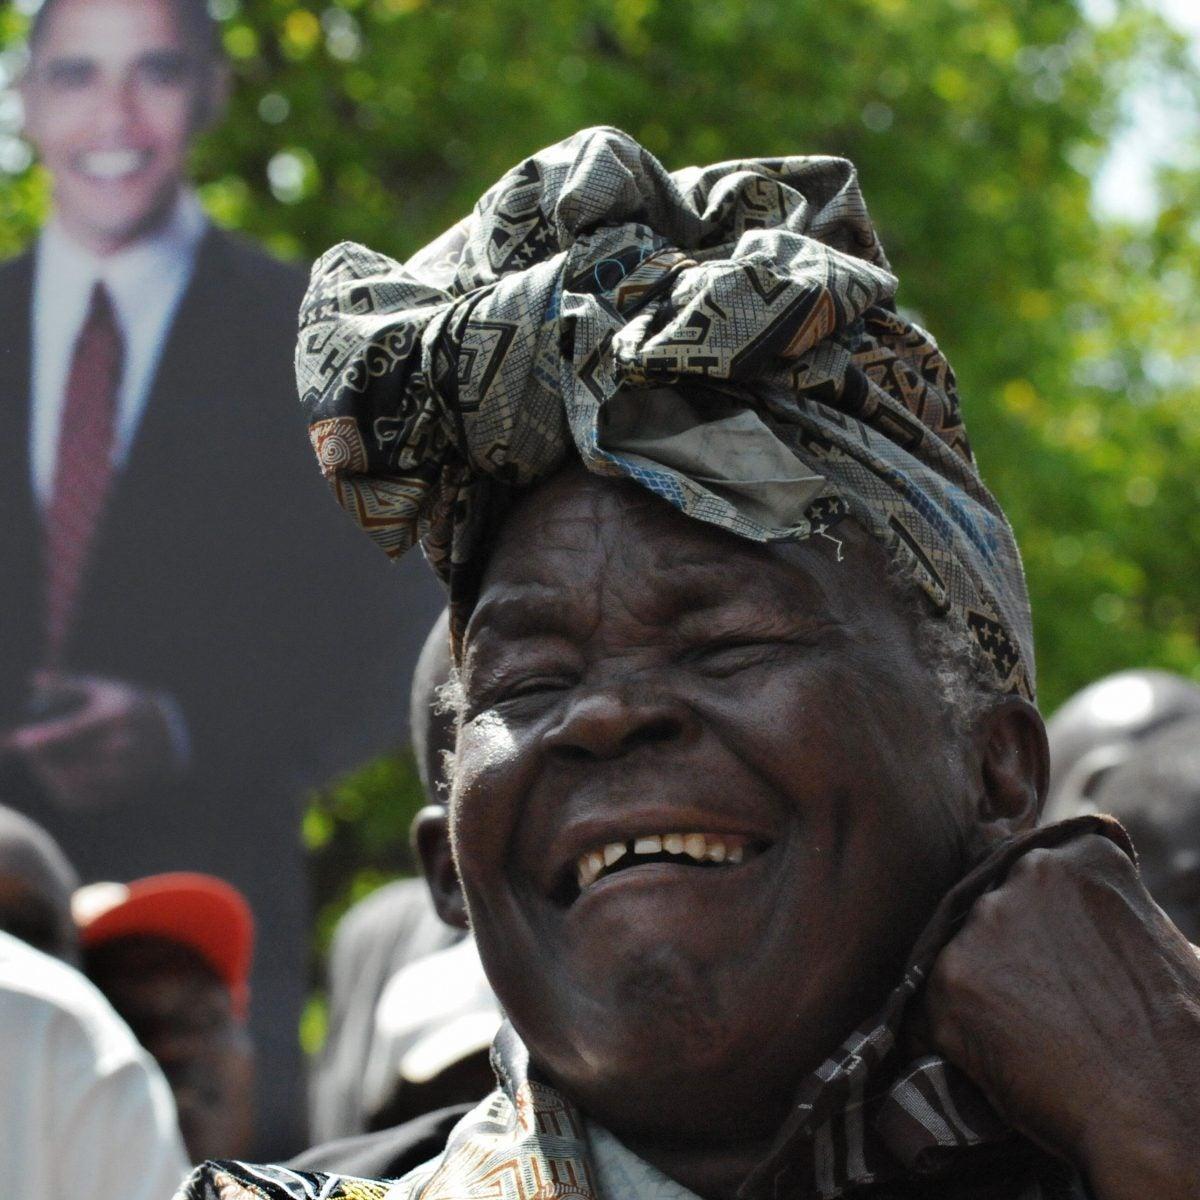 Barack Obama's Step-grandmother Mama Sarah Dies at 99